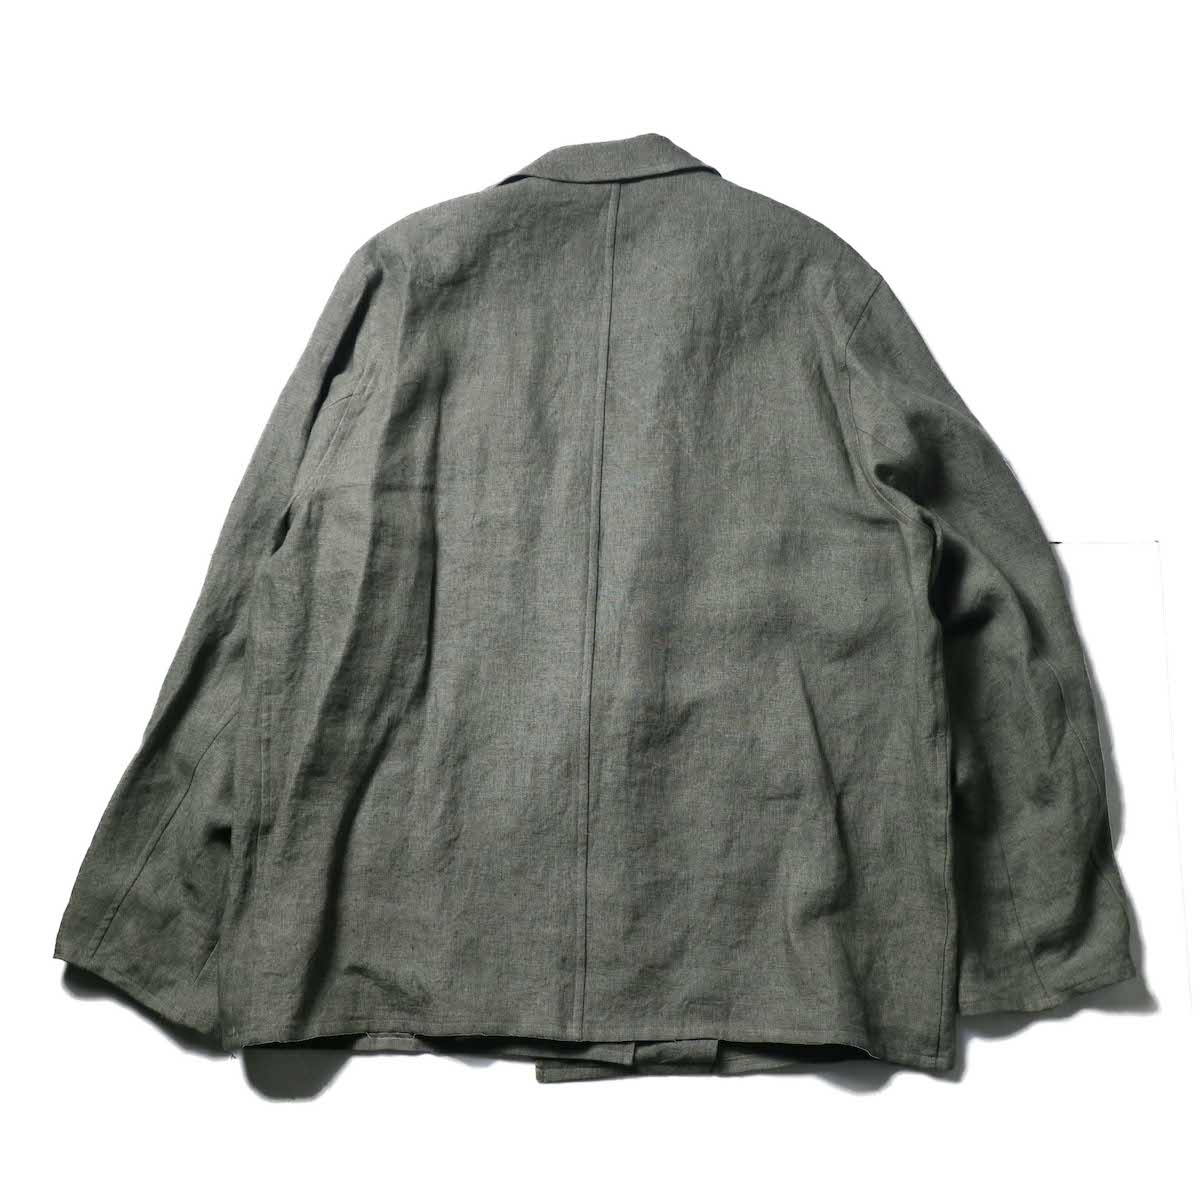 blurhms / Wash Linen Cardigan Jacket (KhakiGrey)背面